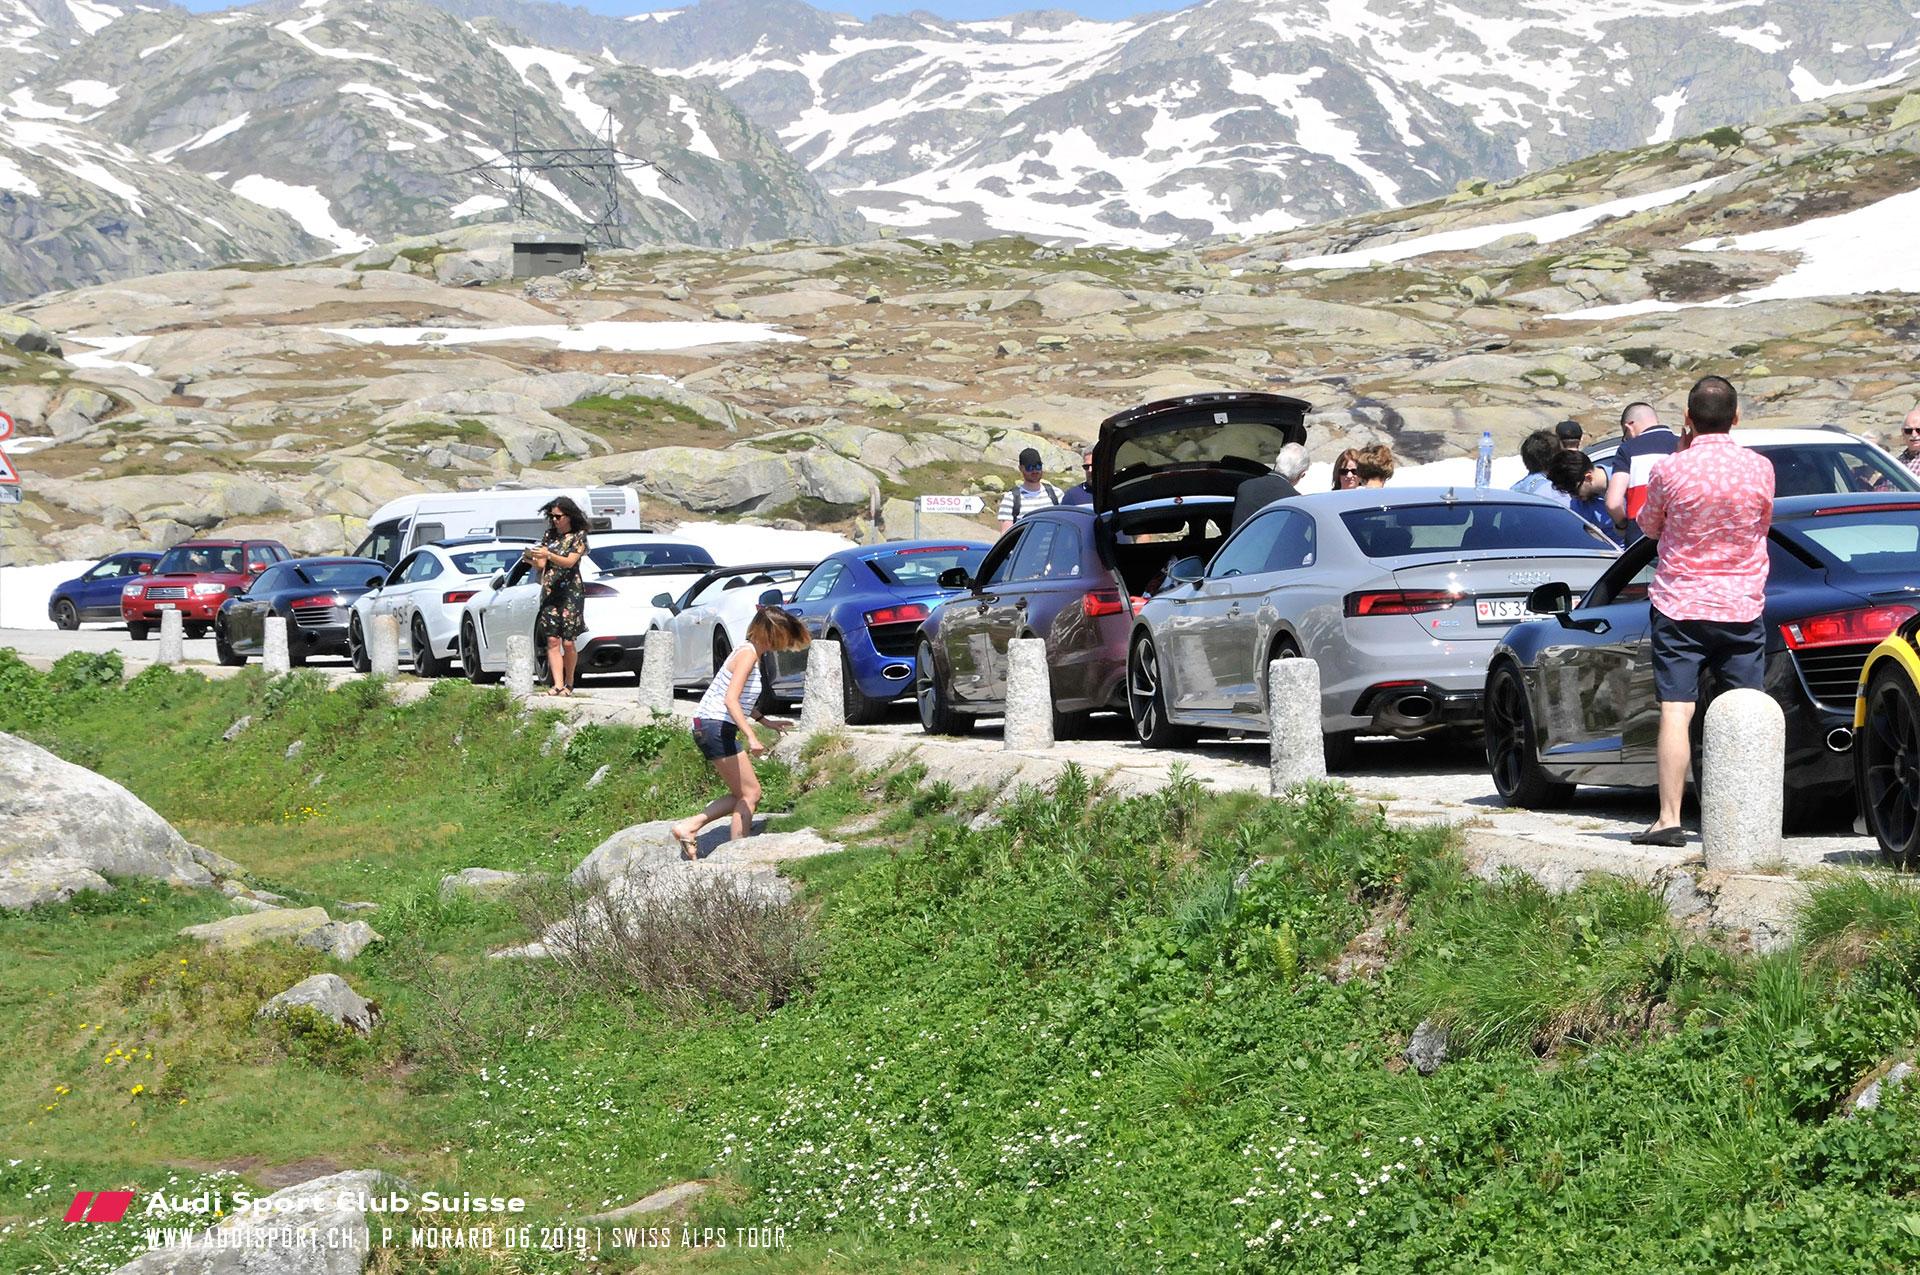 2019, swiss alps tour, audi, ascs